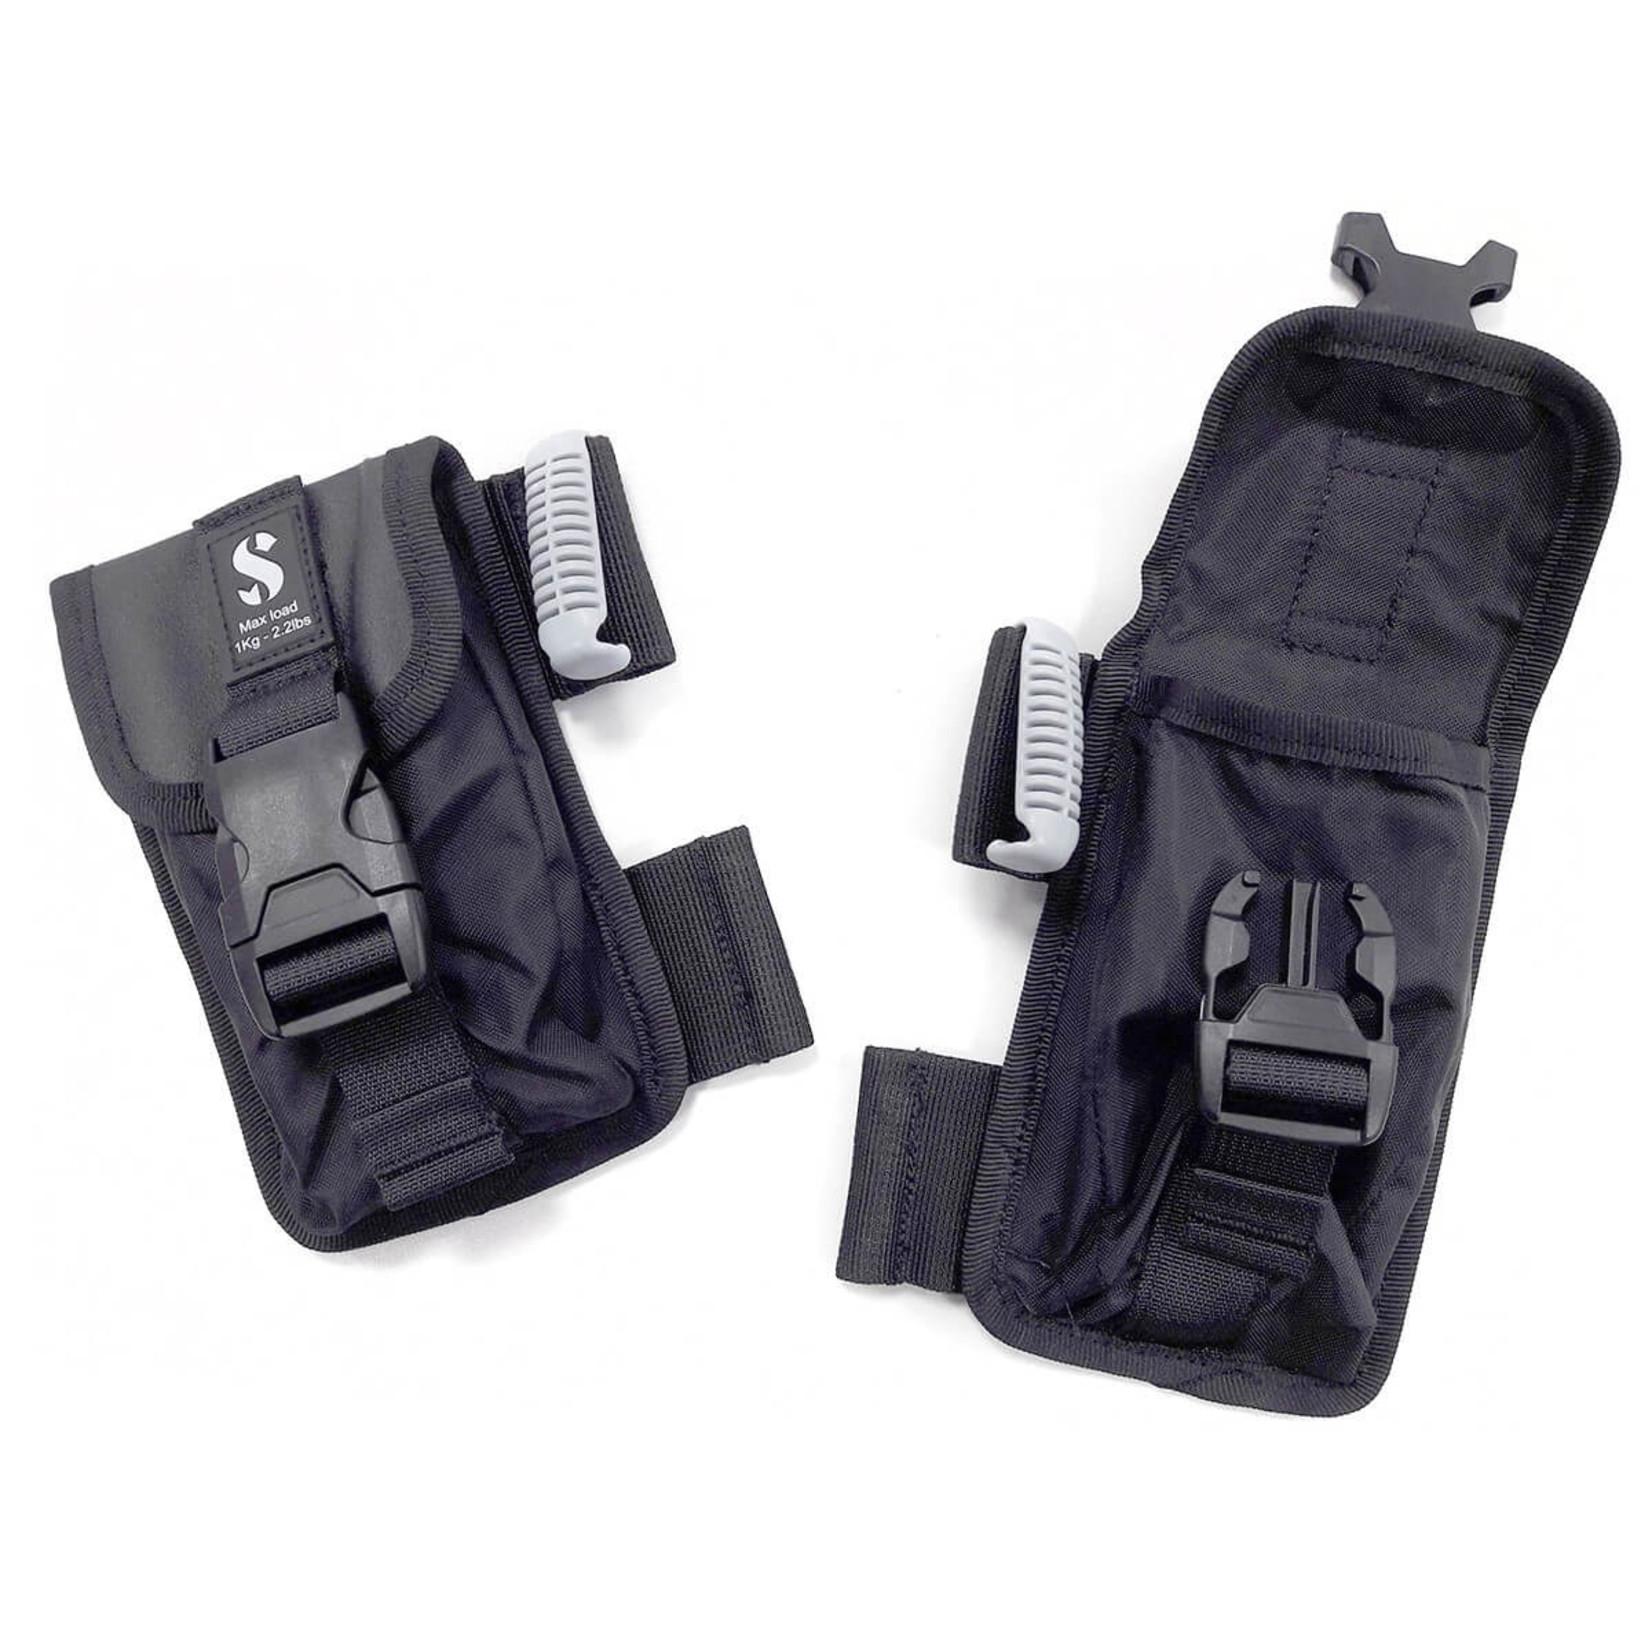 Scubapro Trim Weight Pocket Kit